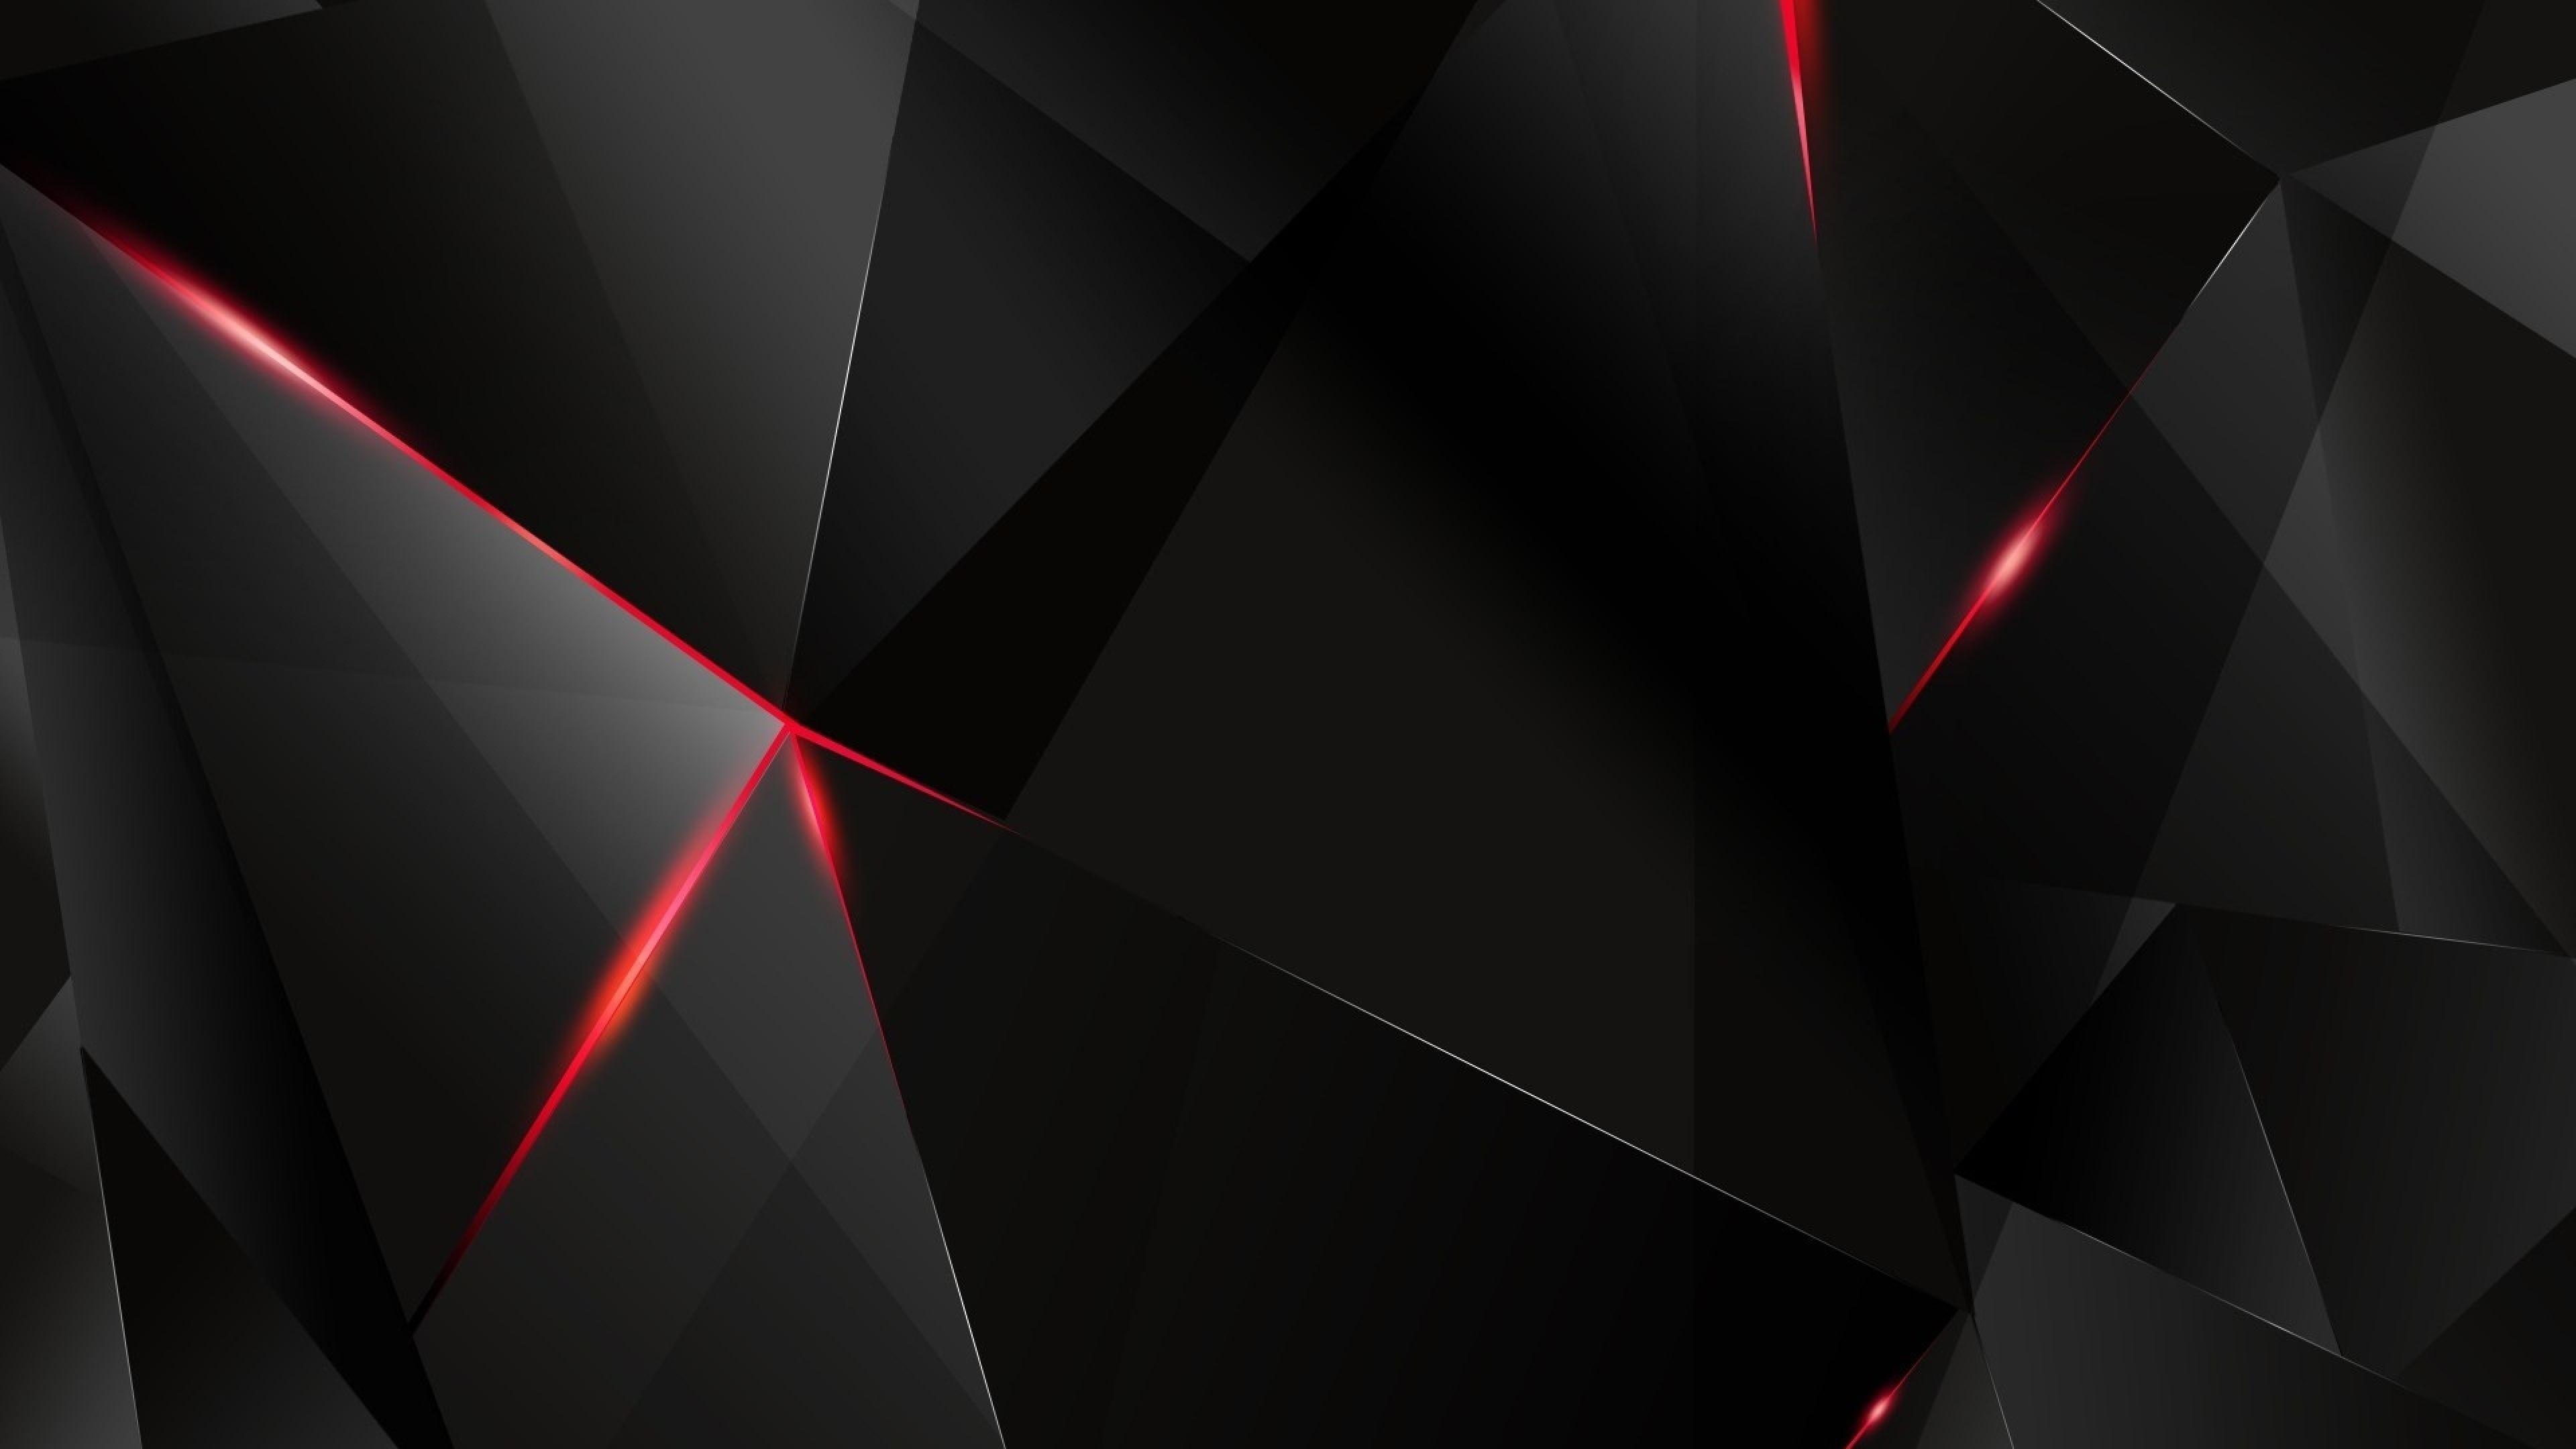 Download Wallpaper 3840x2160 Black, Light, Dark, Figures 4K Ultra ...   vv in 2019   Black ...